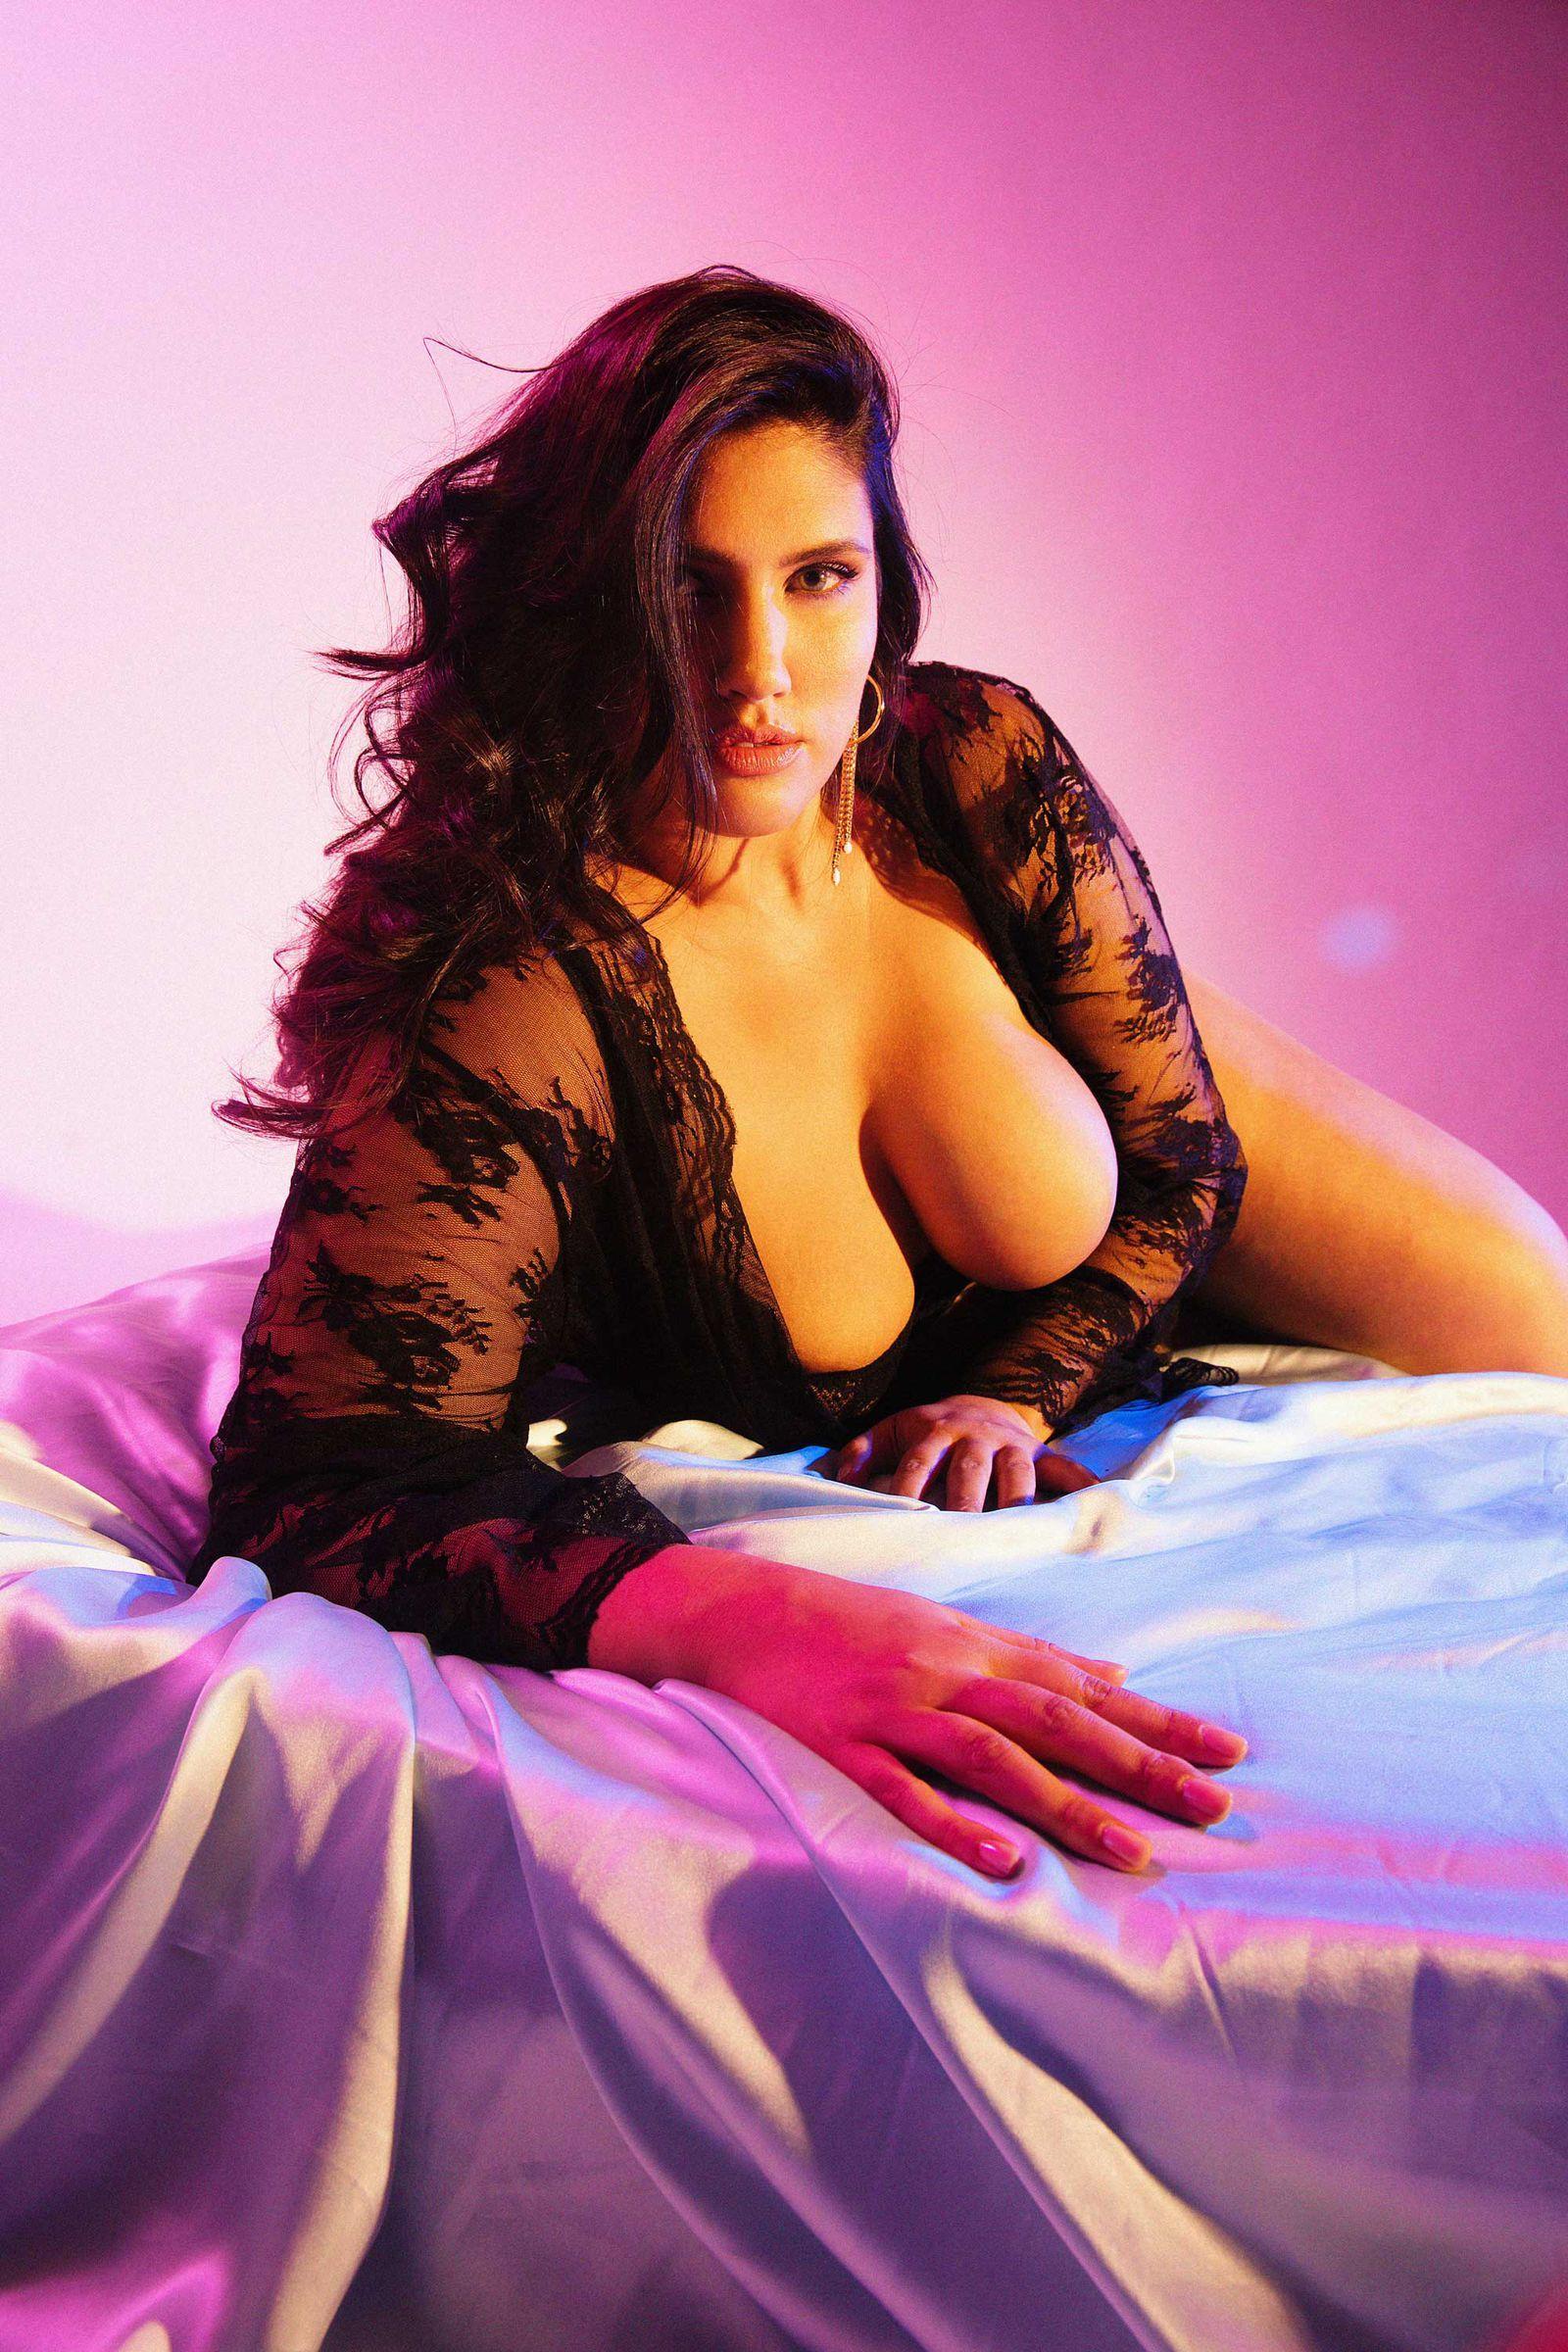 Hot Olivia Peltzer nudes (86 photo), Tits, Hot, Boobs, swimsuit 2006